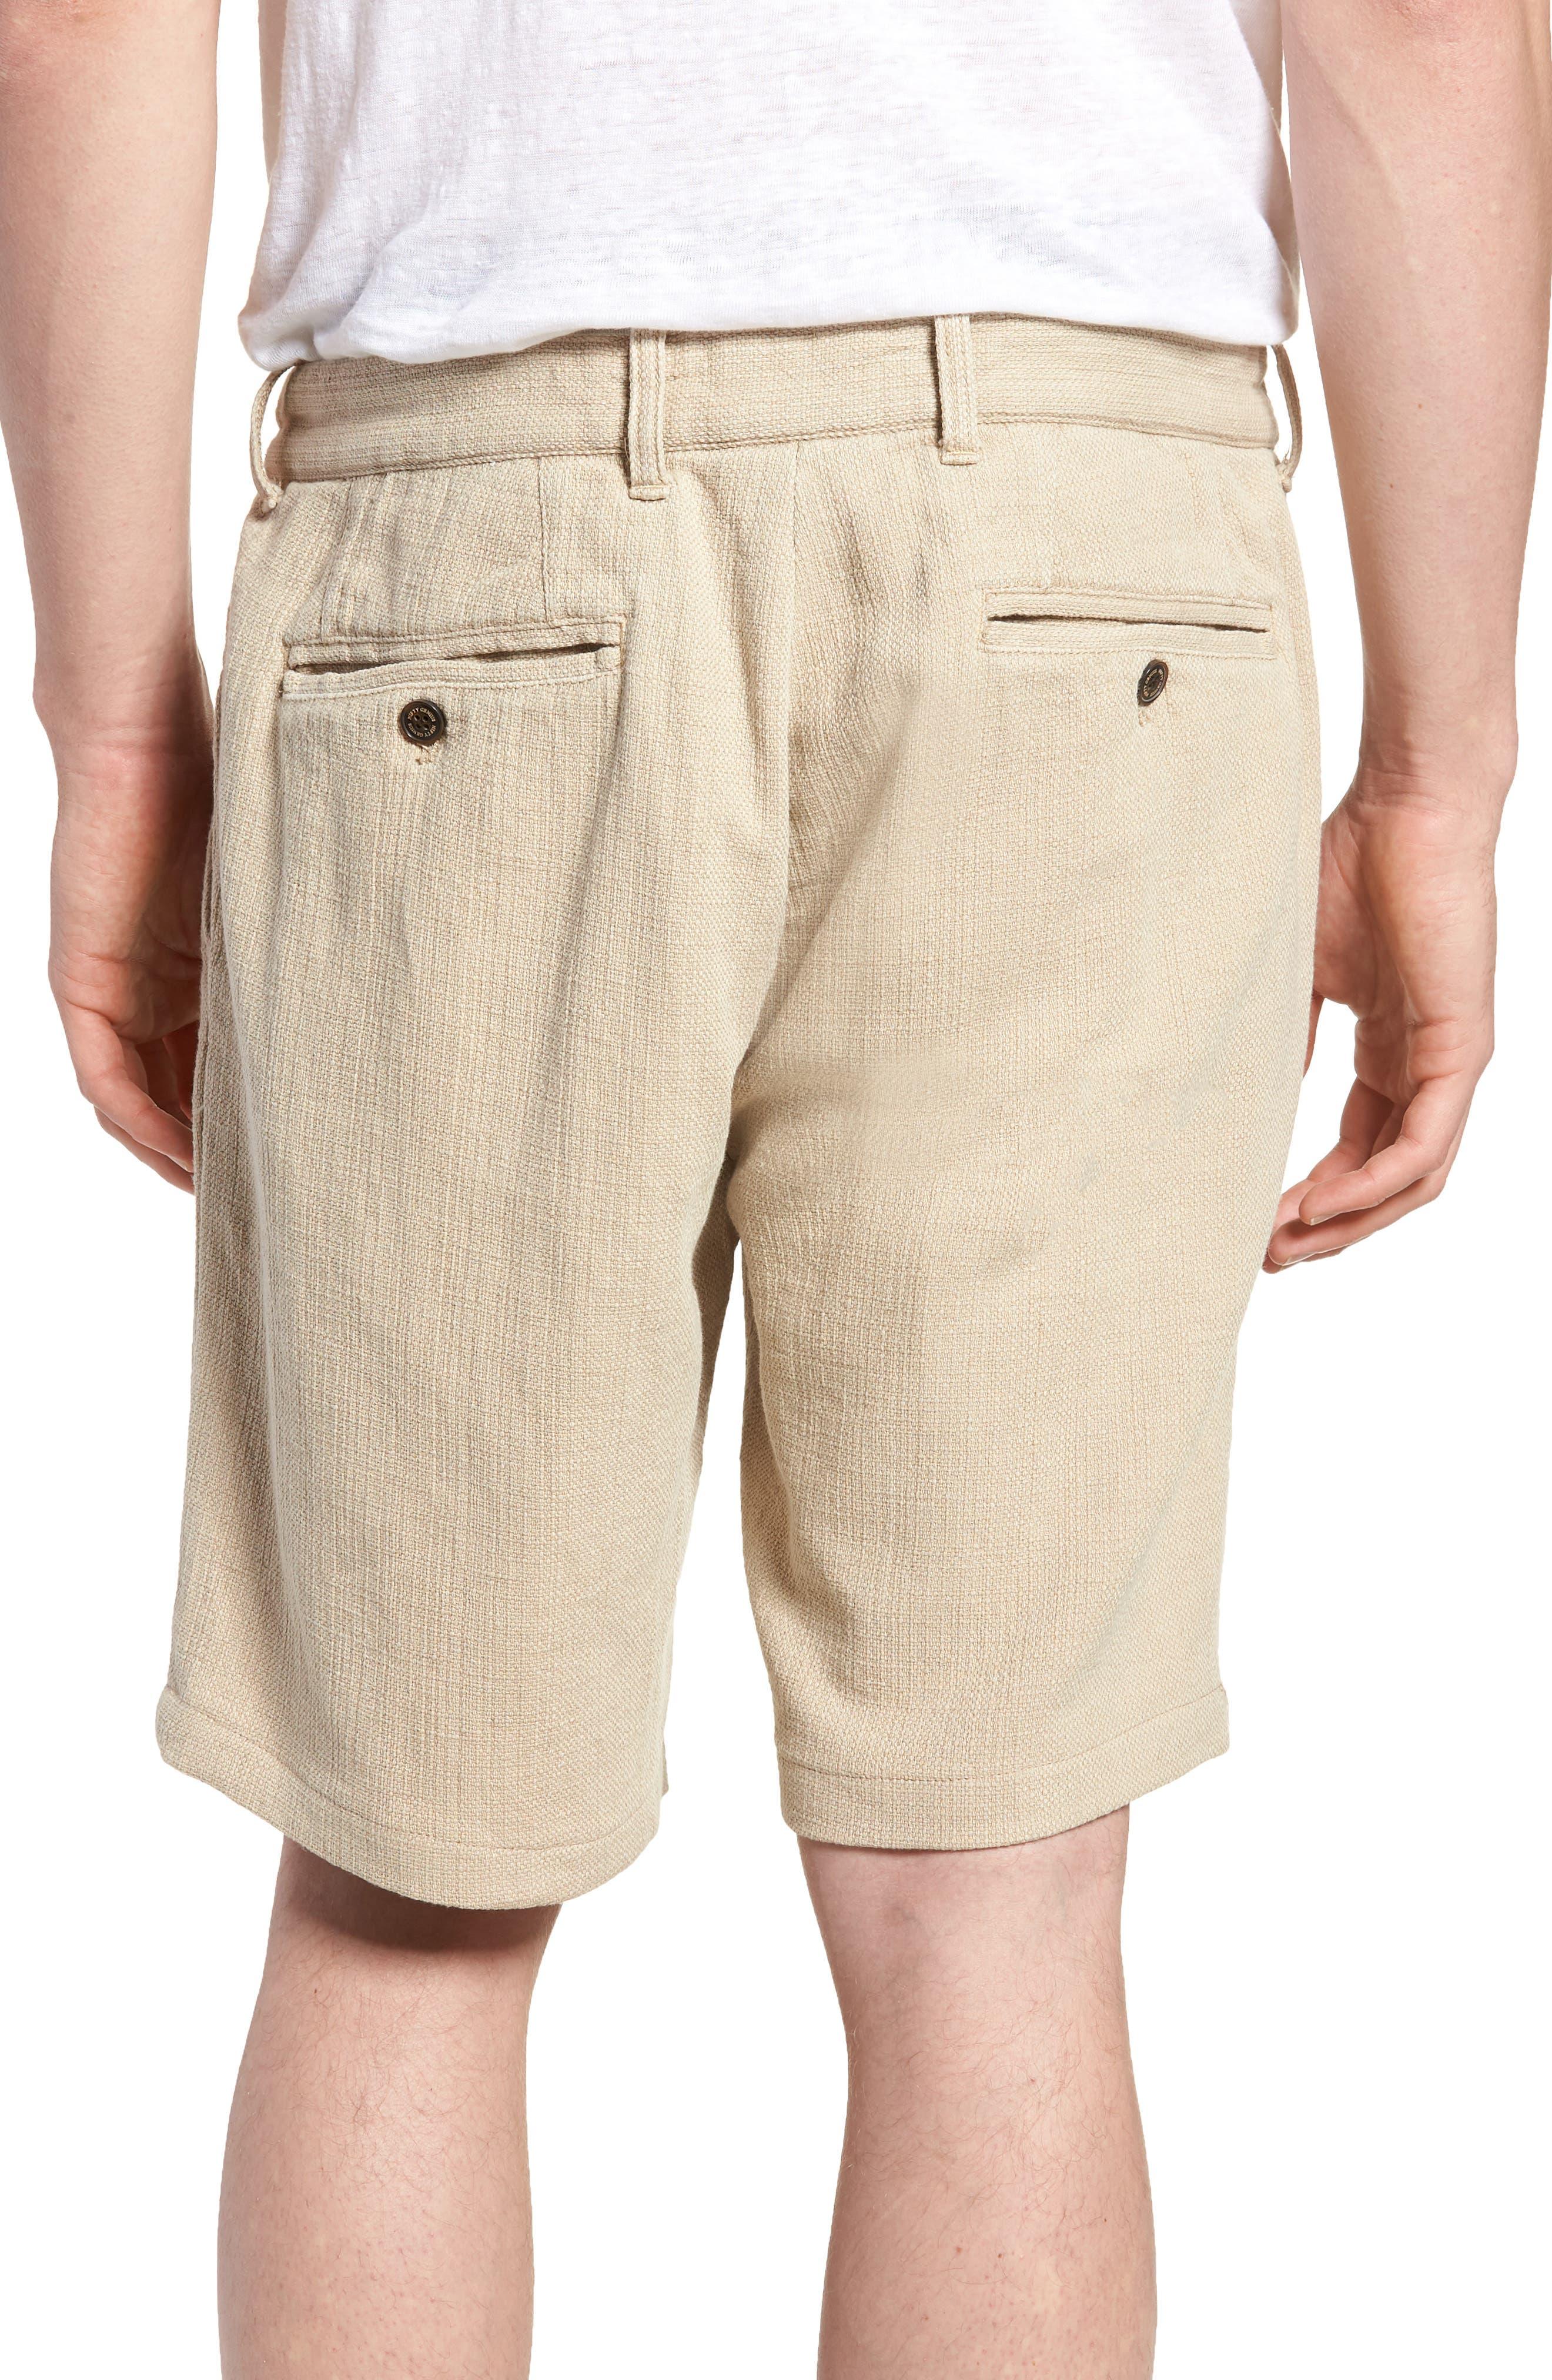 Thomas Regular Fit Pleated Shorts,                             Alternate thumbnail 2, color,                             Tan